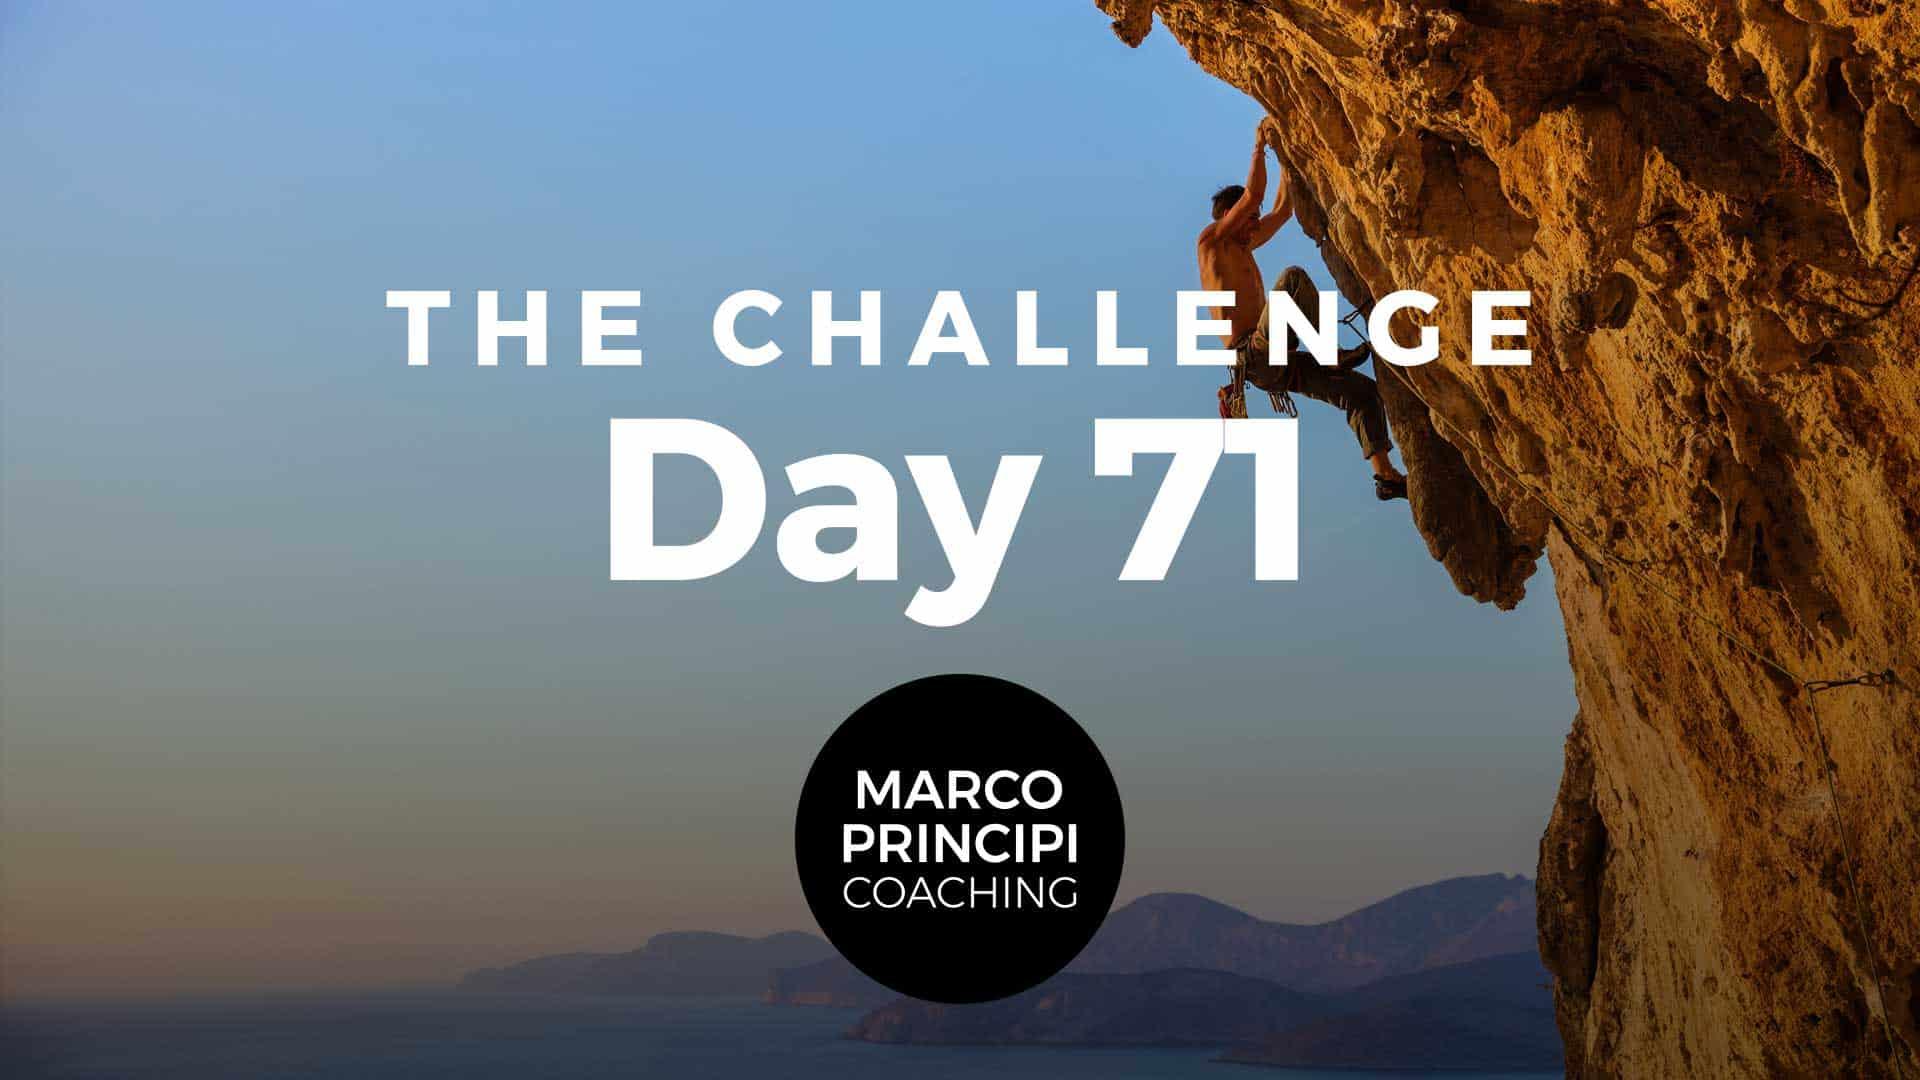 Marco Principi Coaching Challenge Day 71